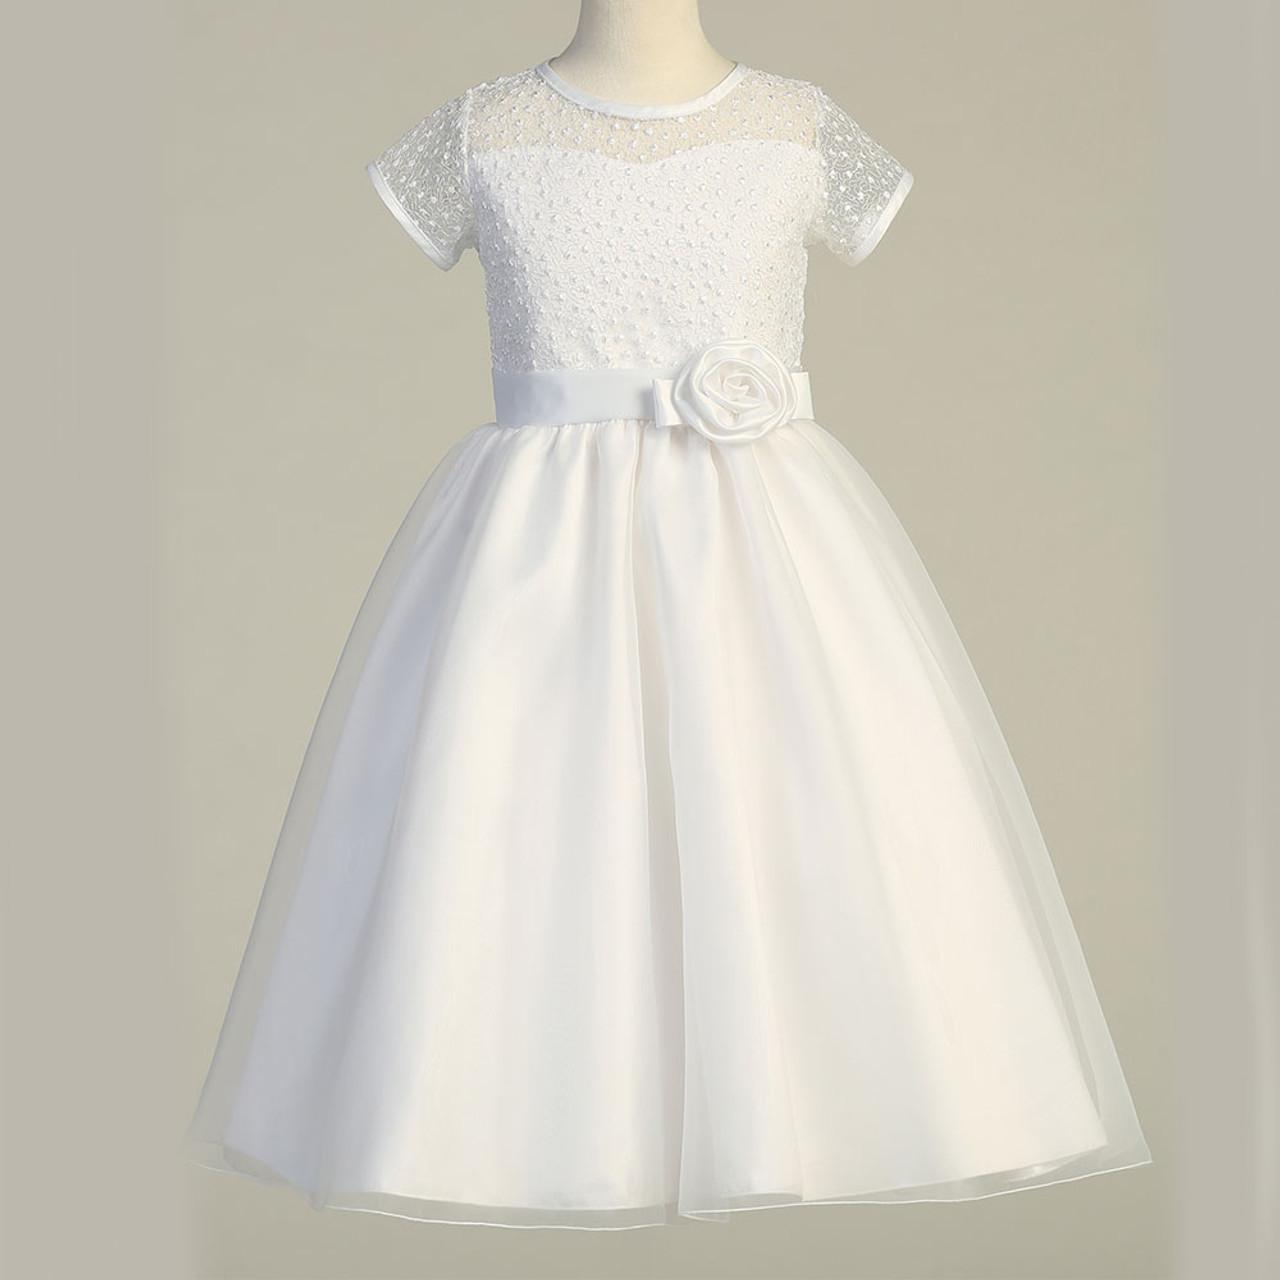 Full Figure Teresa First Communion Dress